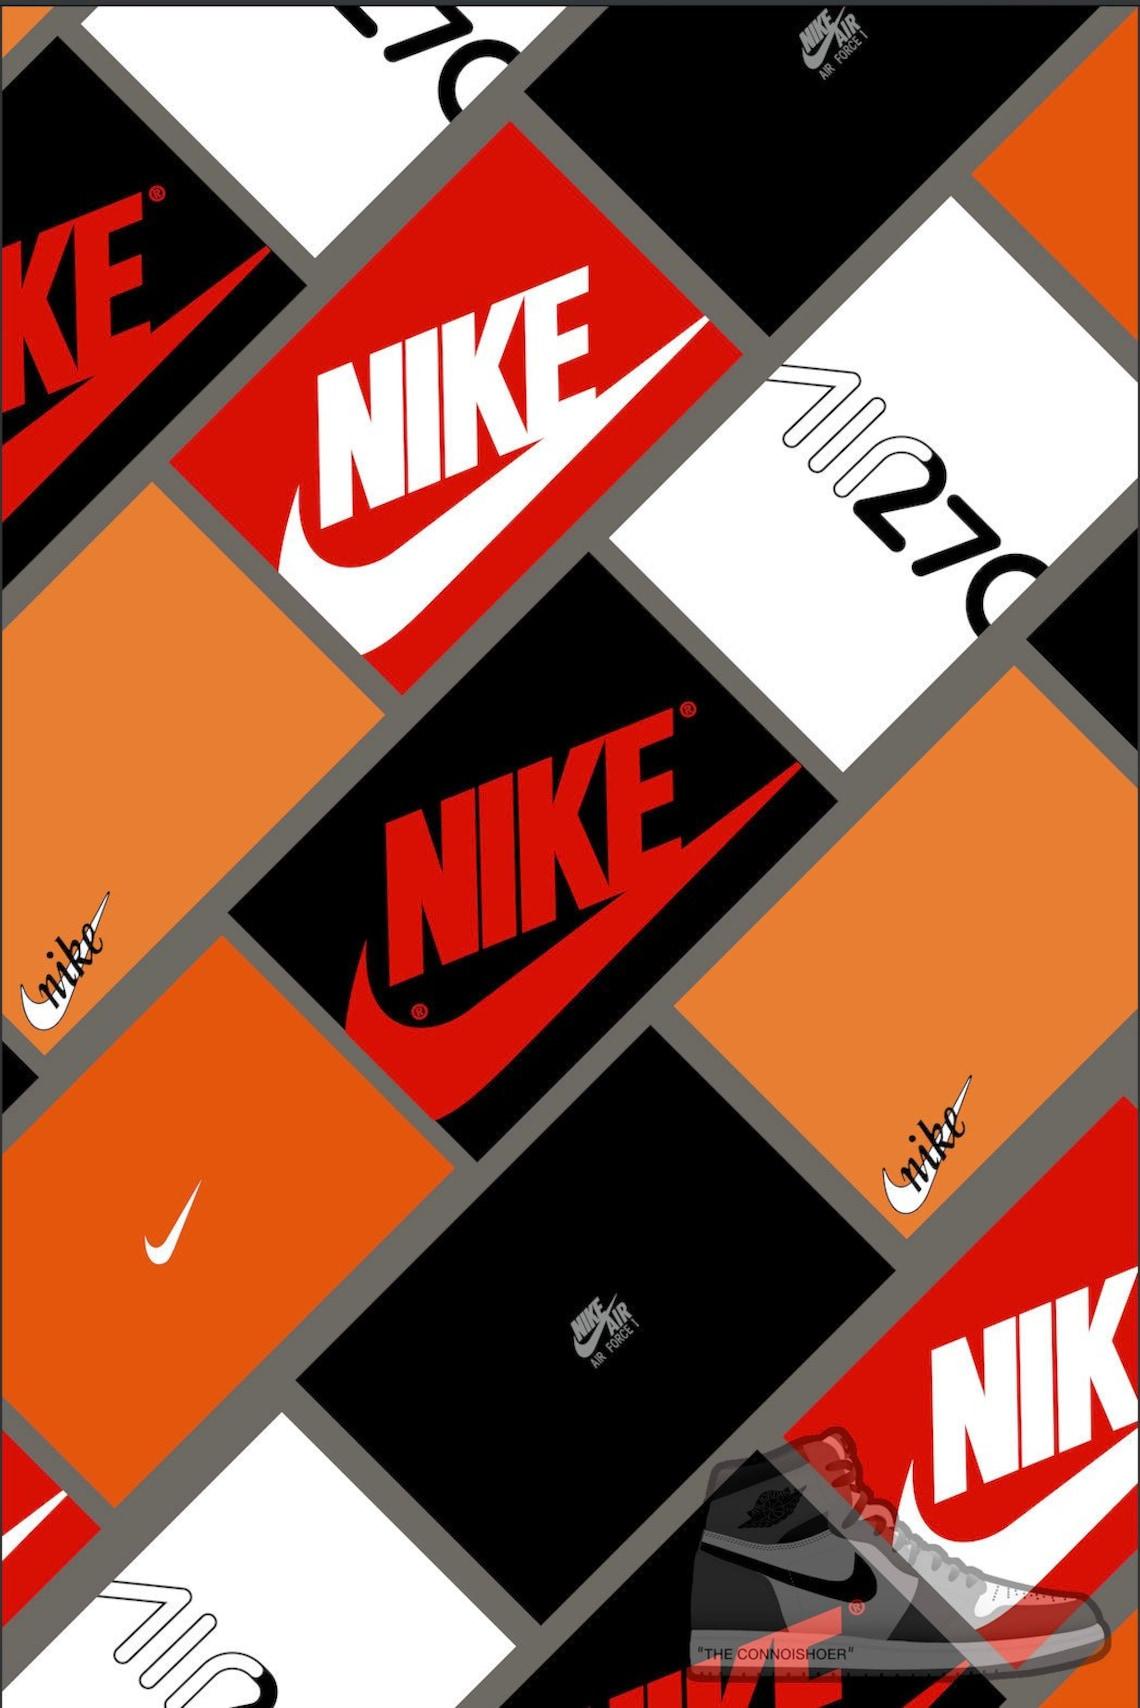 Nike Sneaker Box Wall Art Poster image 0